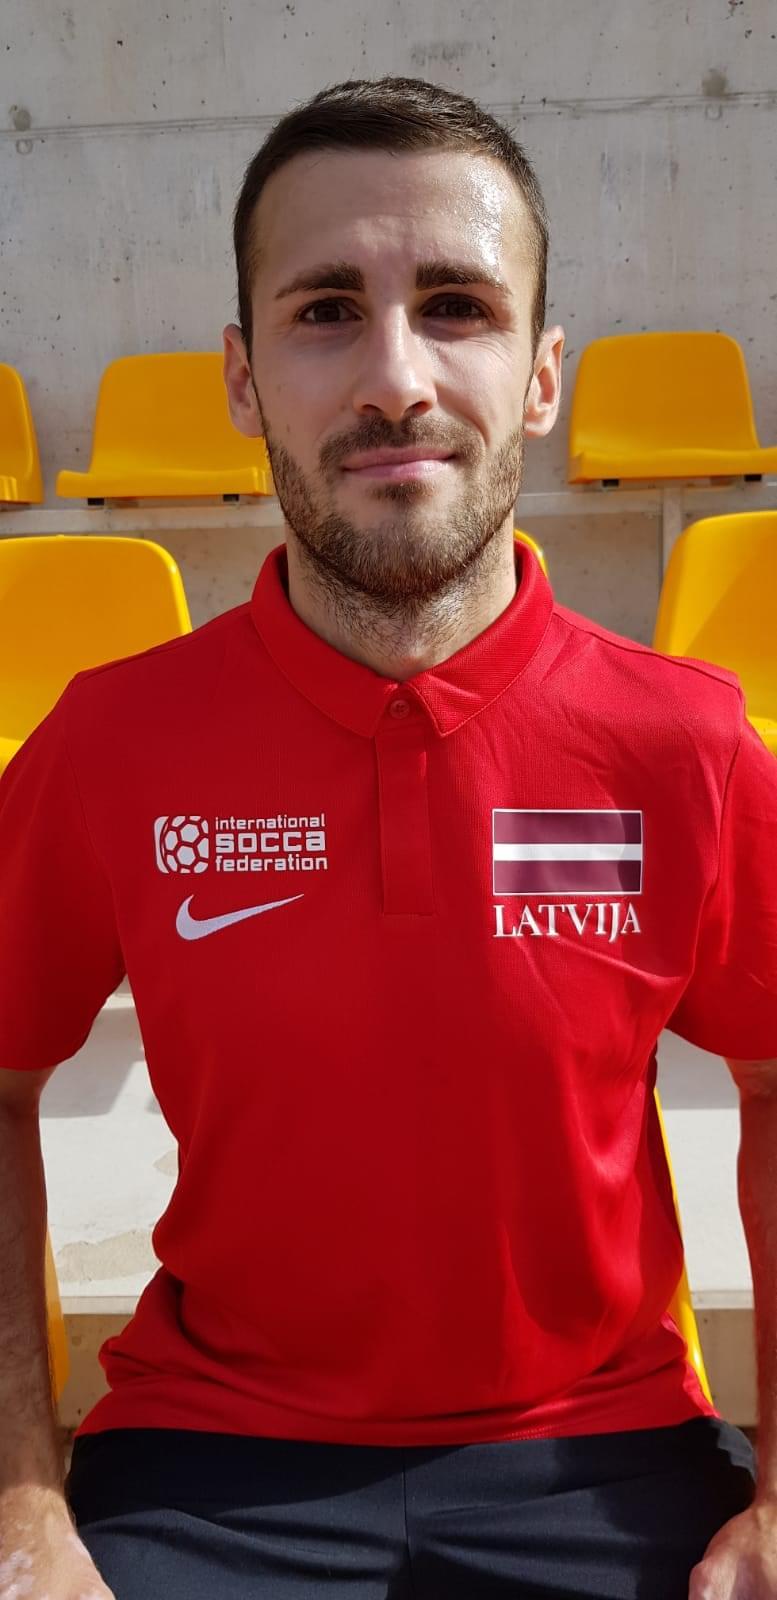 Andrejs Sitiks